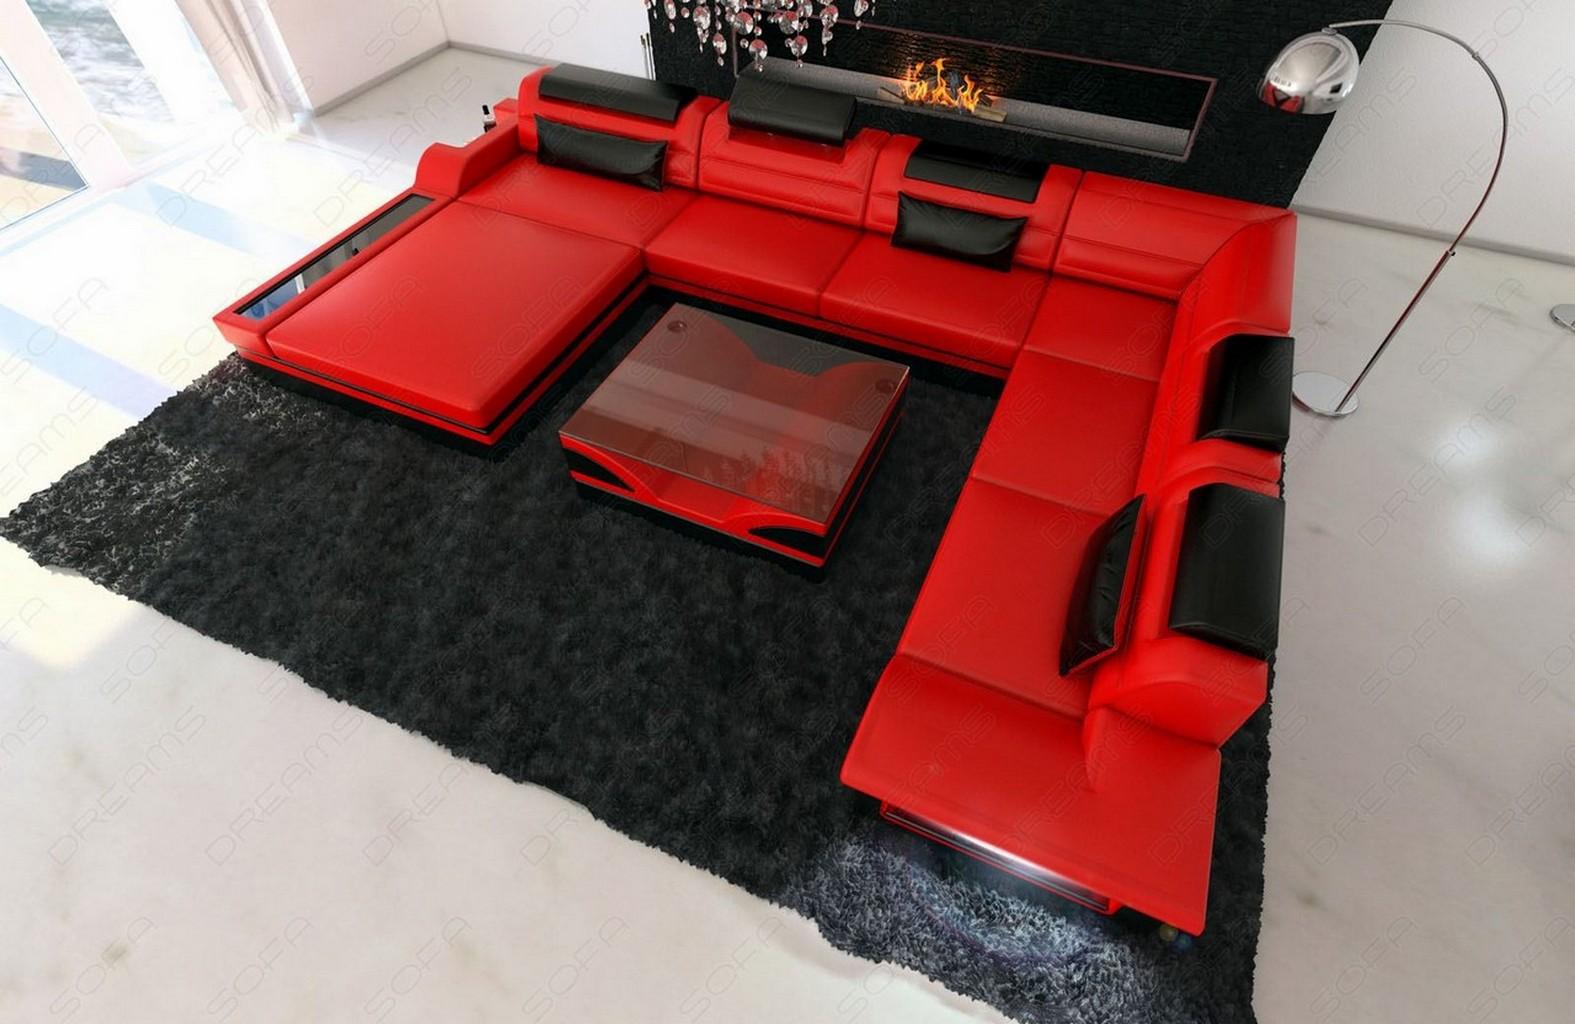 designersofa luxus mezzo xxl mega wohnlandschaft rot schwarz ebay. Black Bedroom Furniture Sets. Home Design Ideas